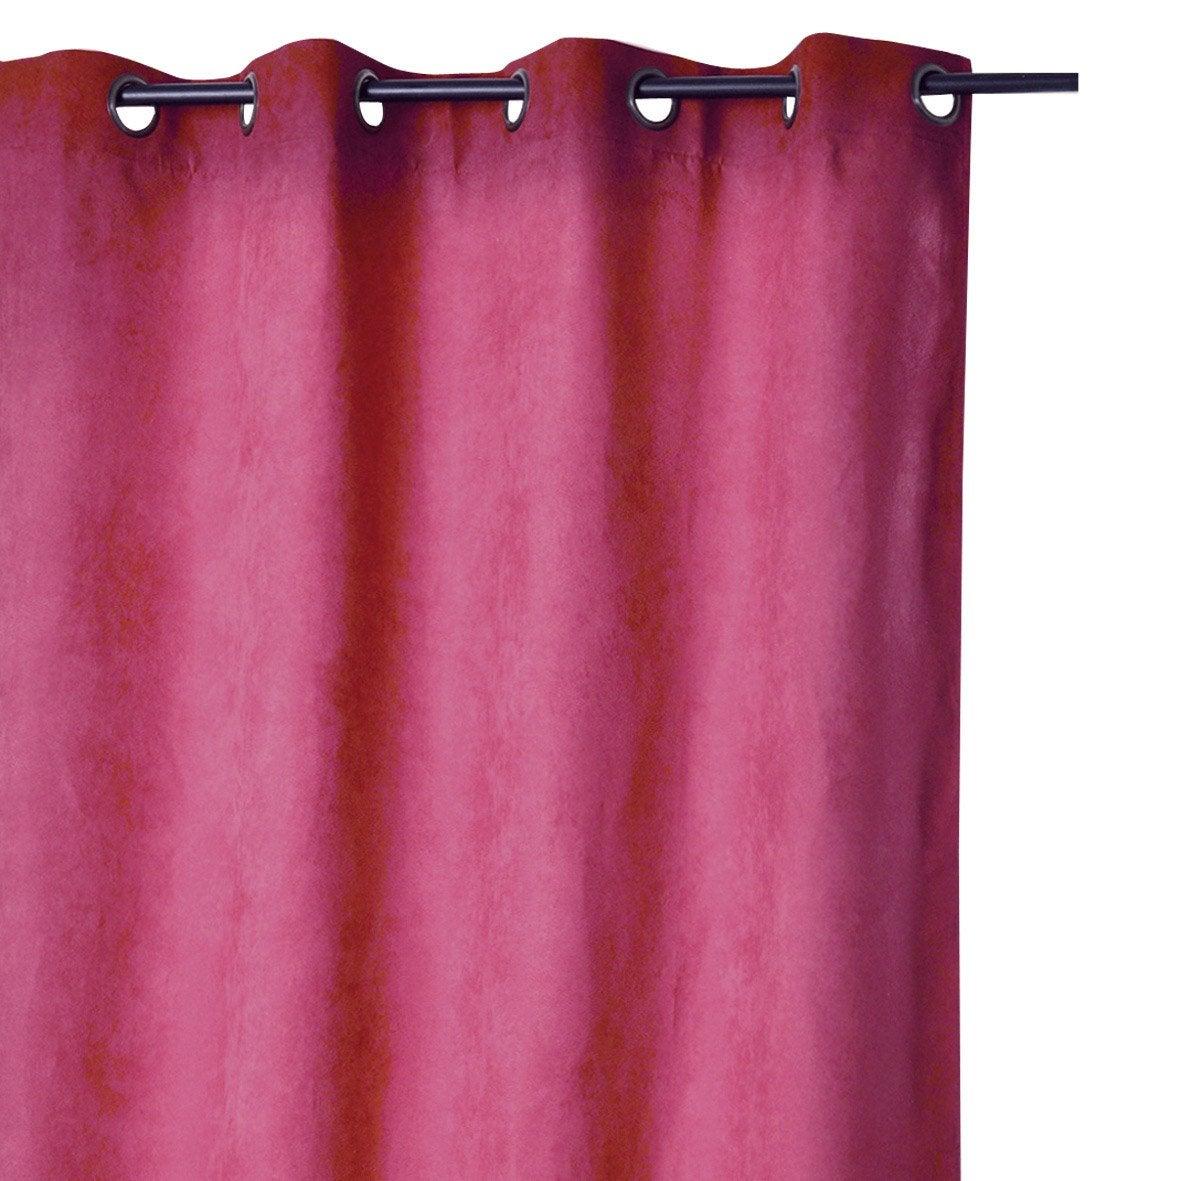 rideau suedine occultante piment x cm leroy merlin. Black Bedroom Furniture Sets. Home Design Ideas